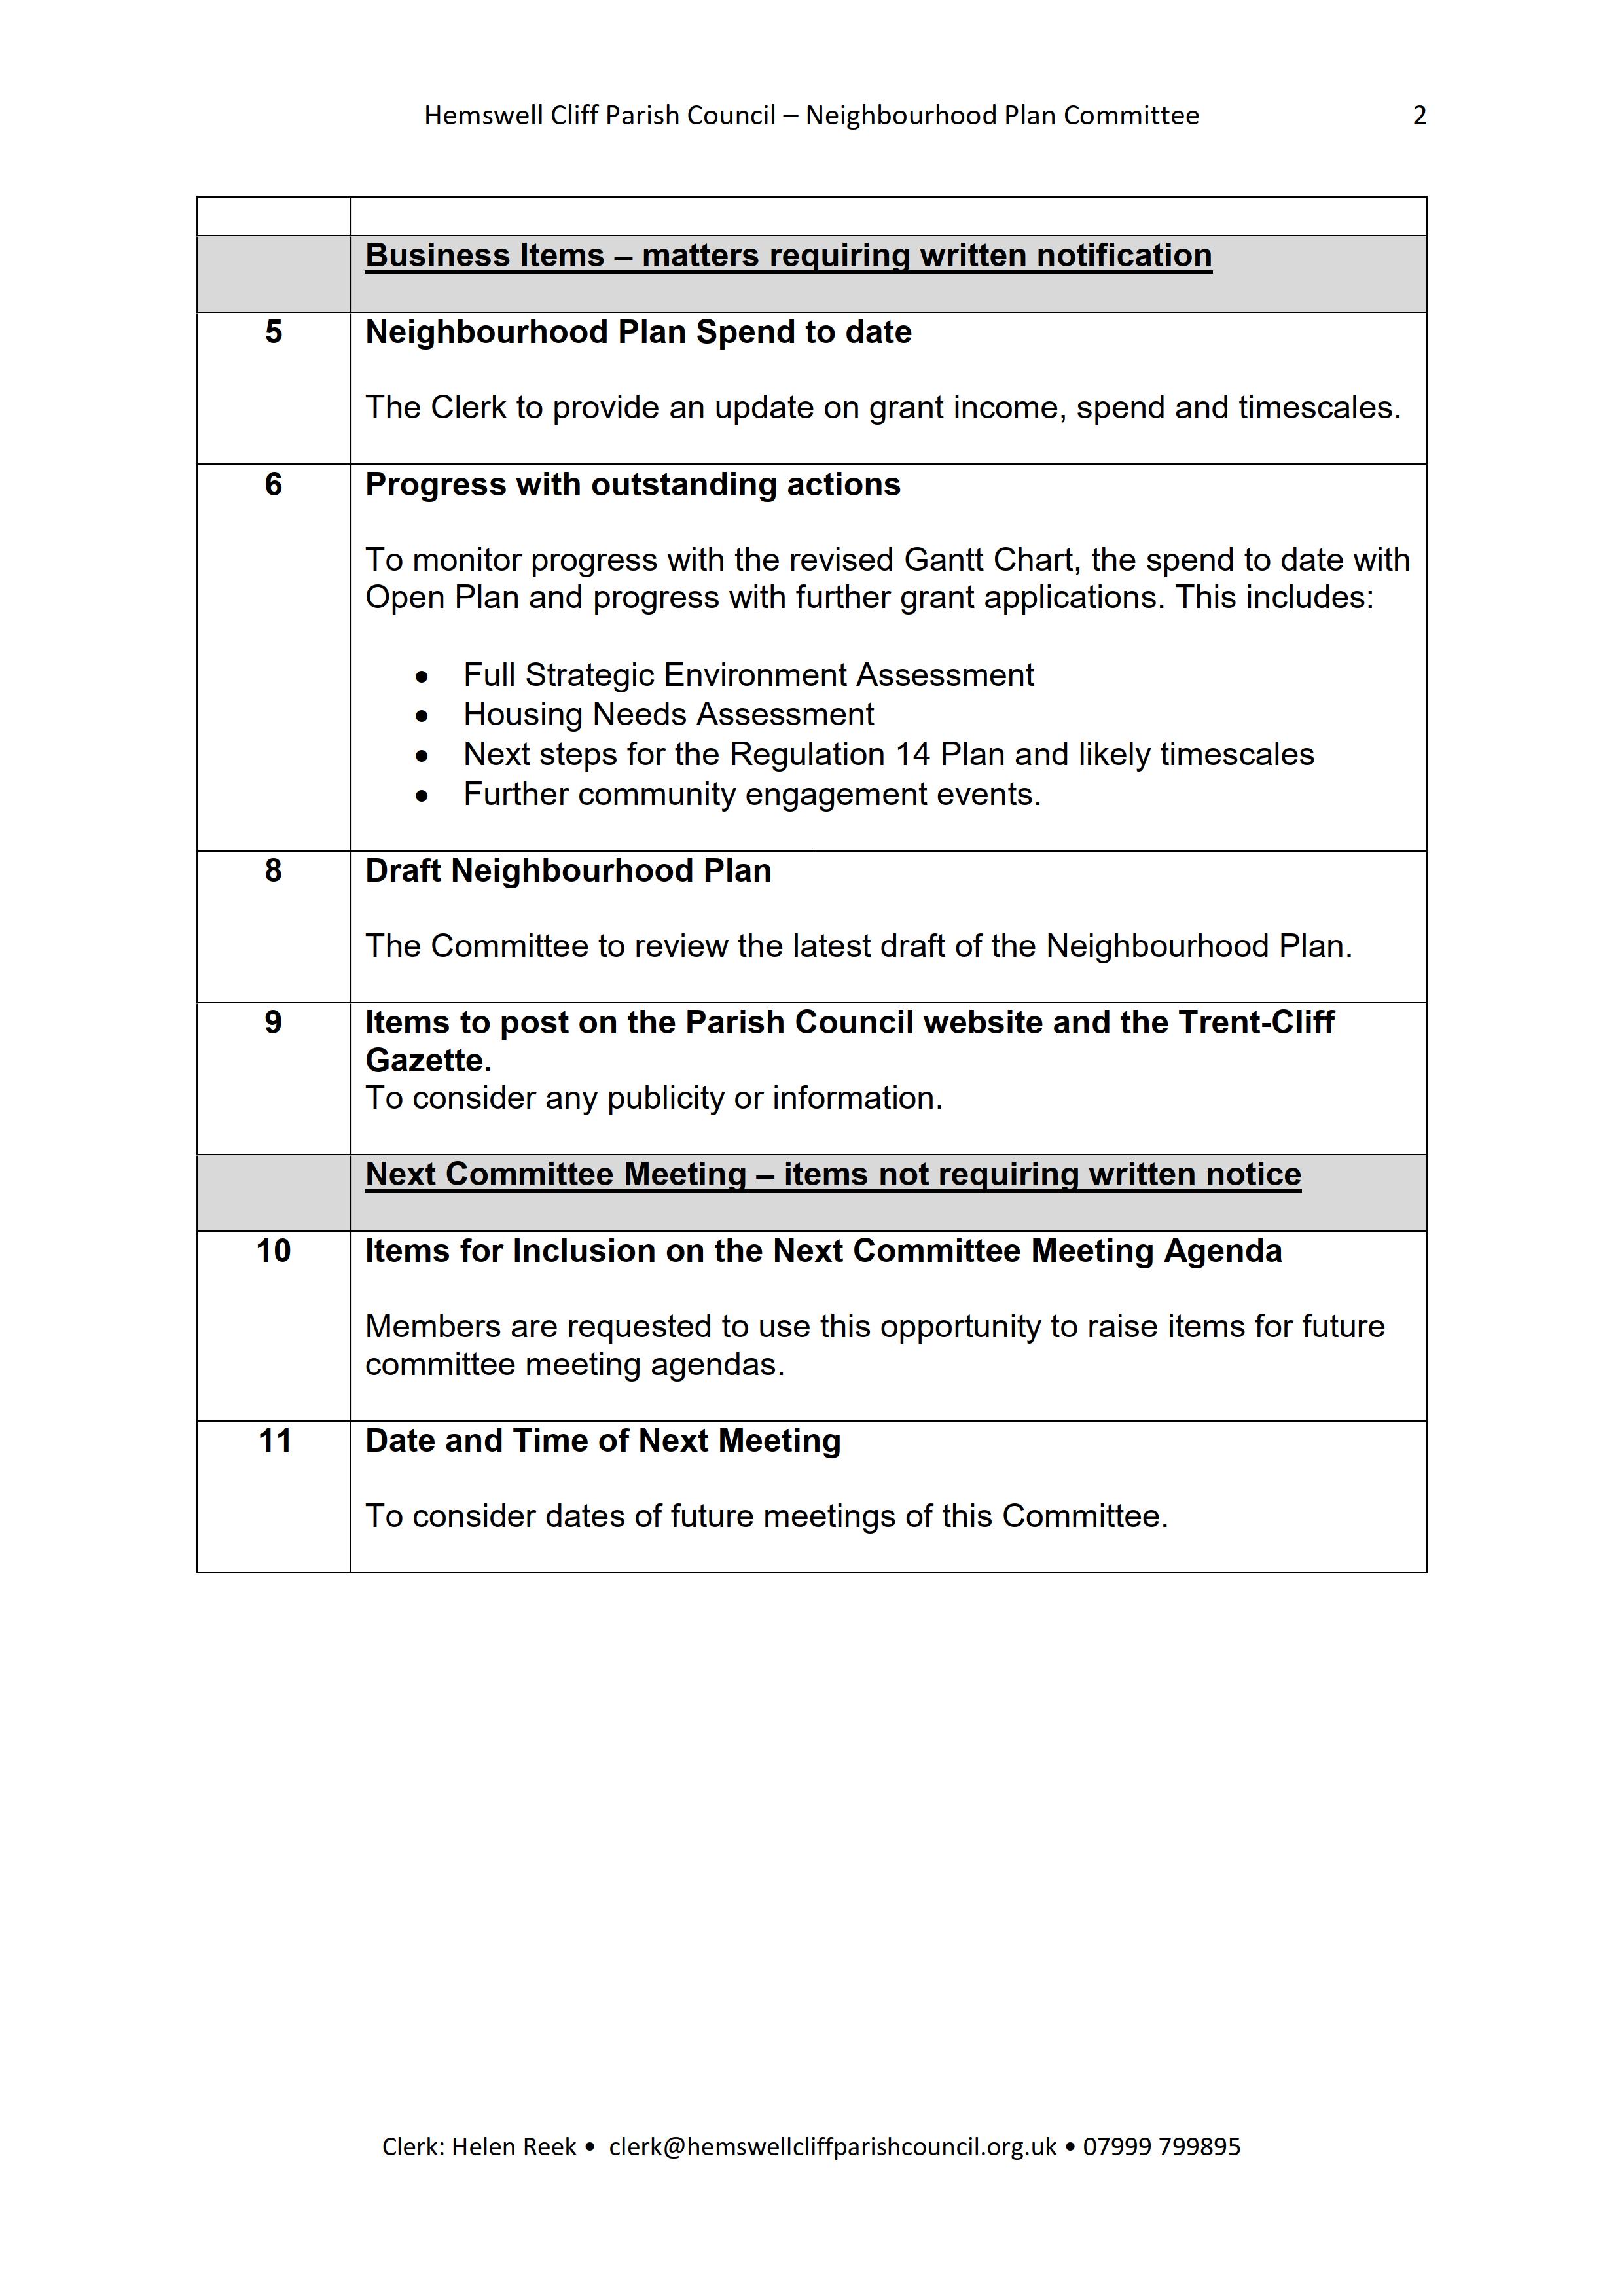 HCPC_NPC_Agenda_16.03.20_2.png